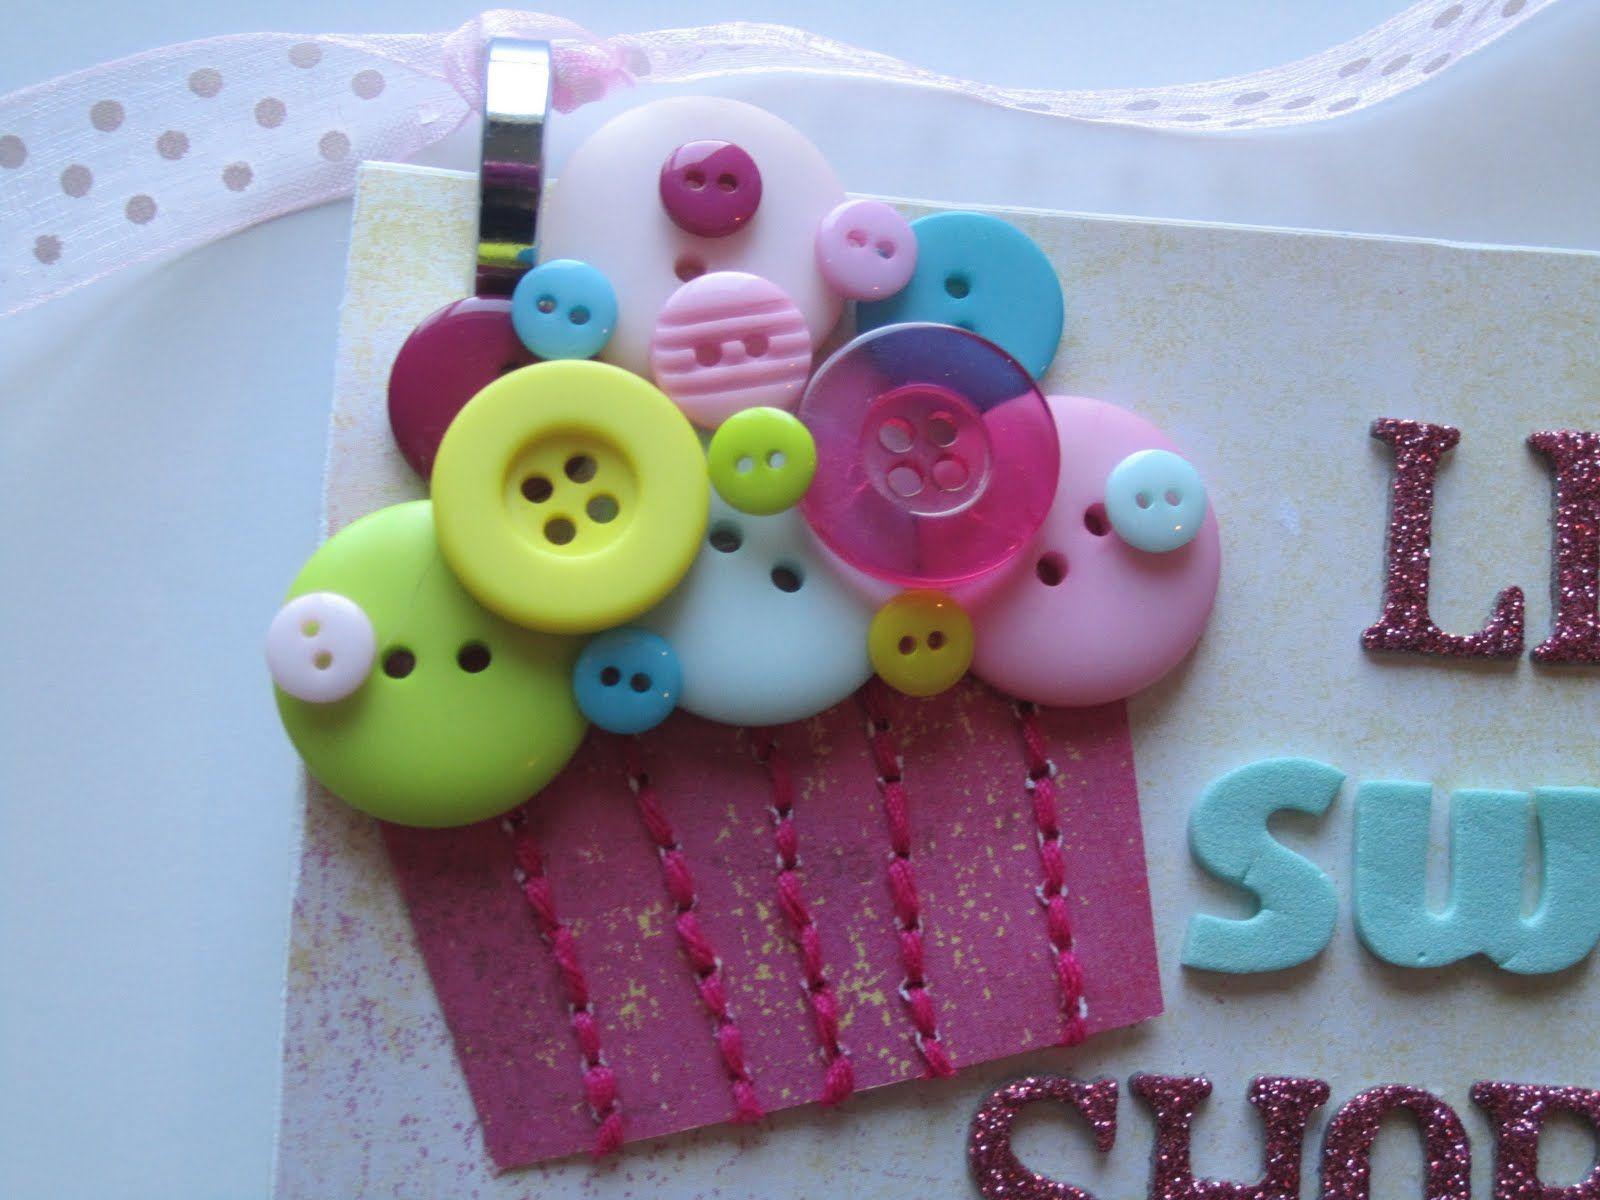 Cutesy Button Cupcake Love it!